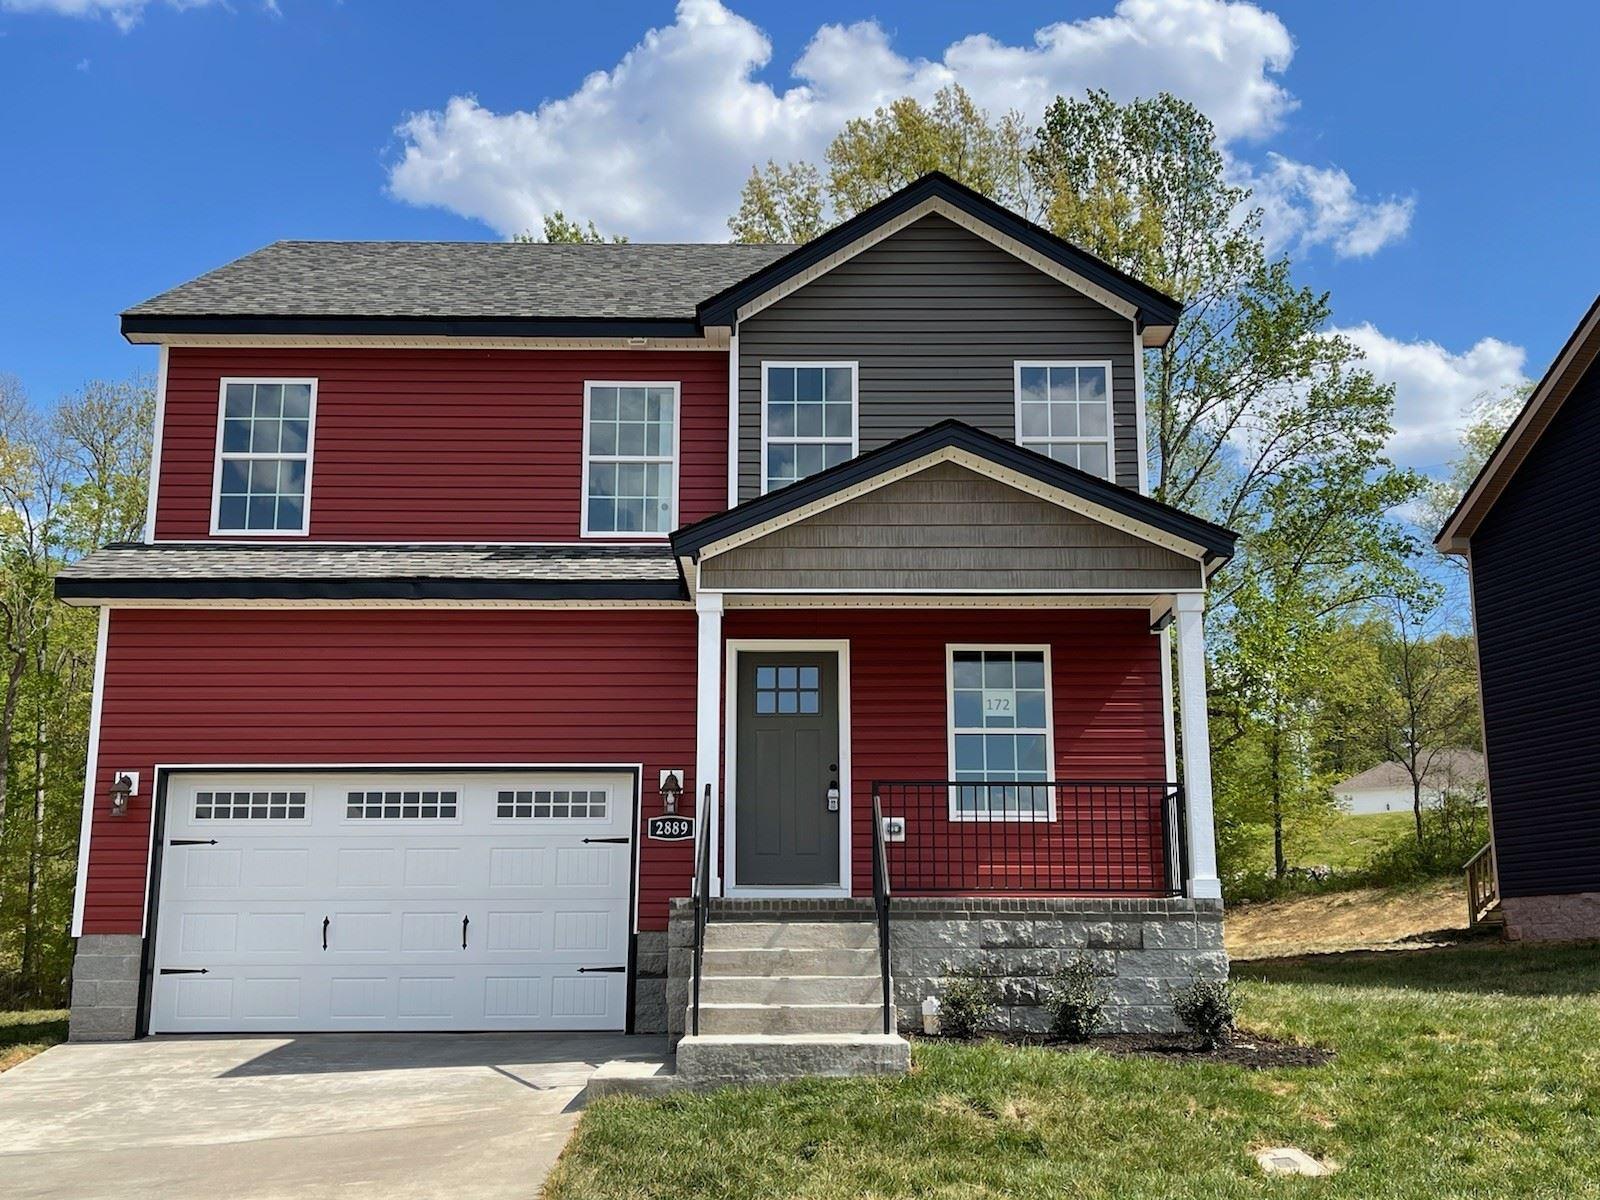 2889 Teakwood Drive, Clarksville, TN 37040 - MLS#: 2219624